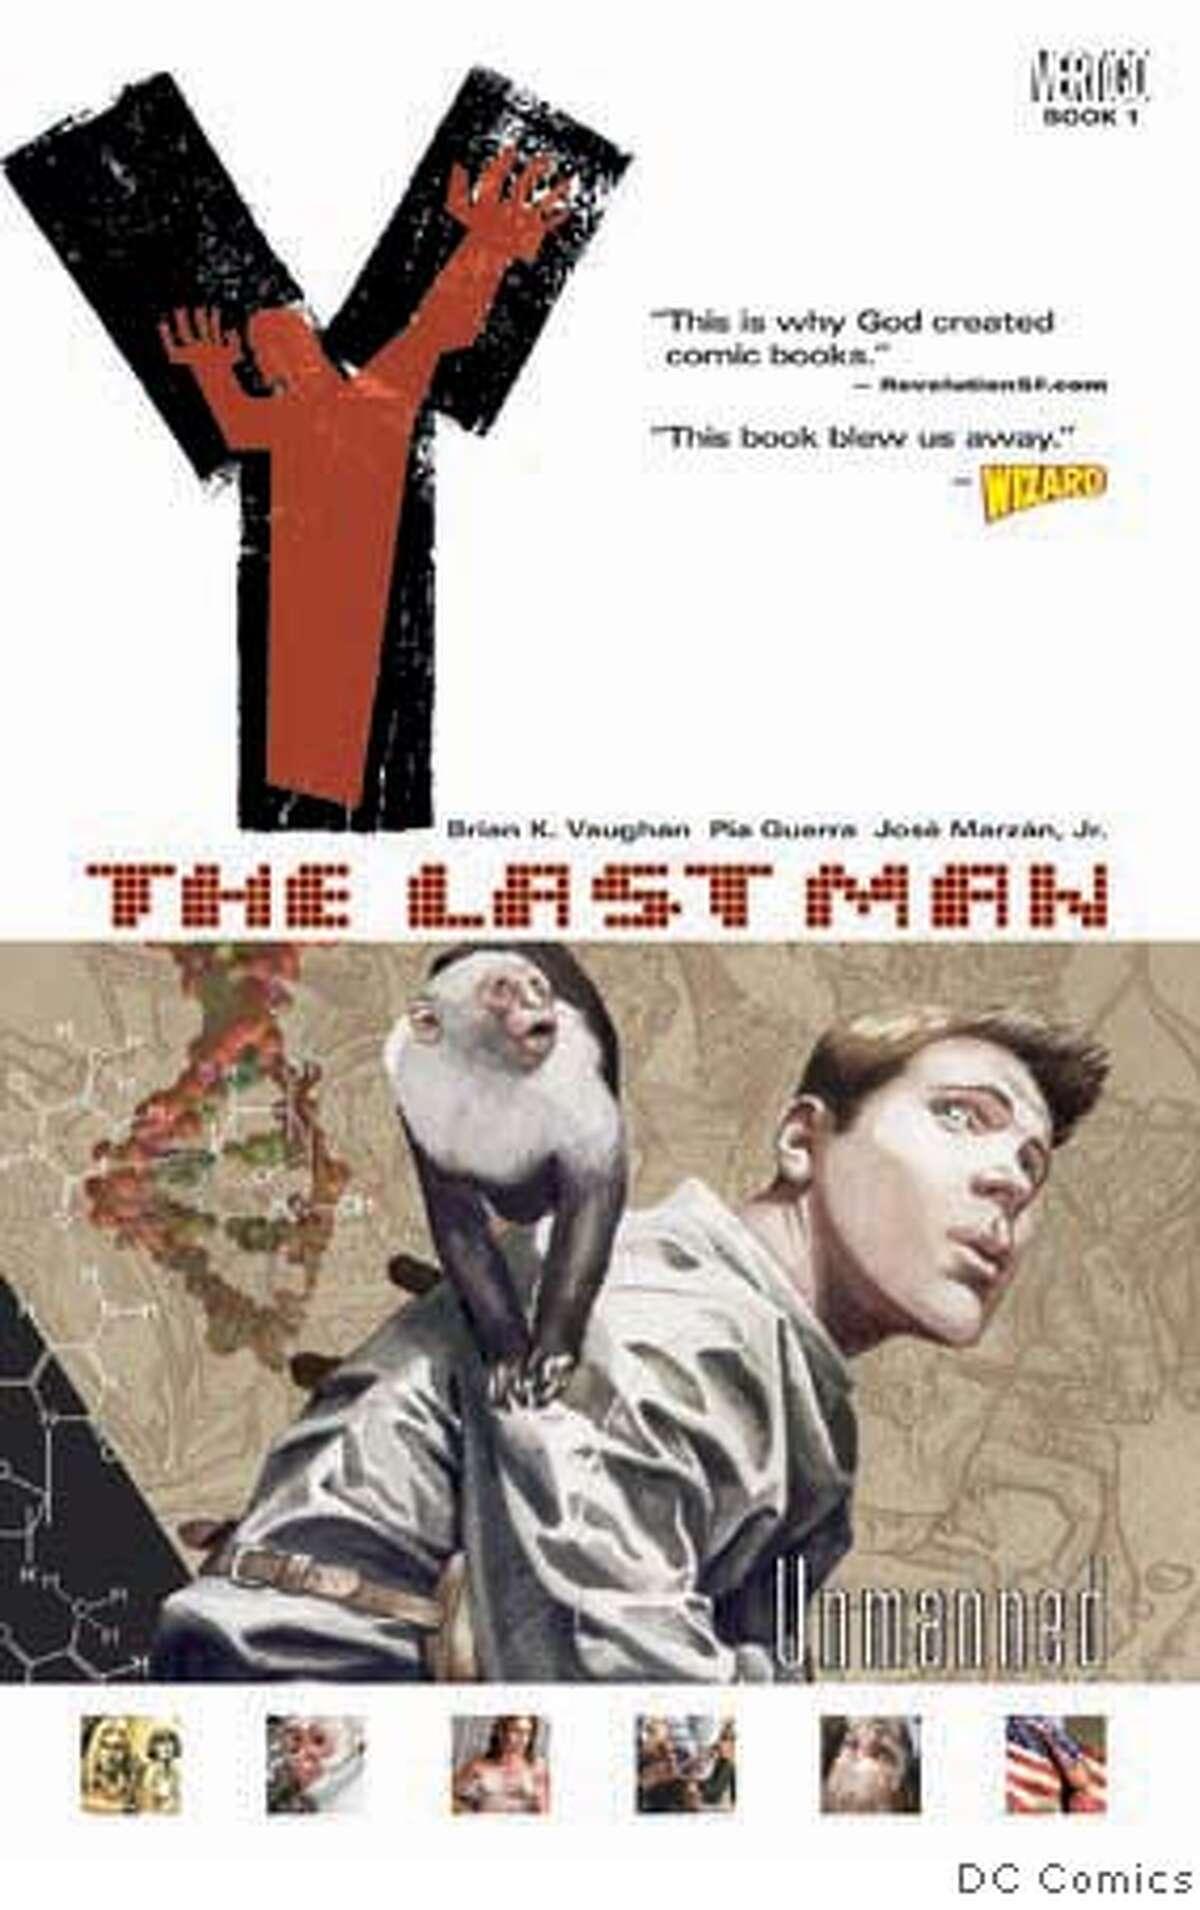 """The Last Man - Unmanned"" by Vertigo Comics Credit: DC Comics"